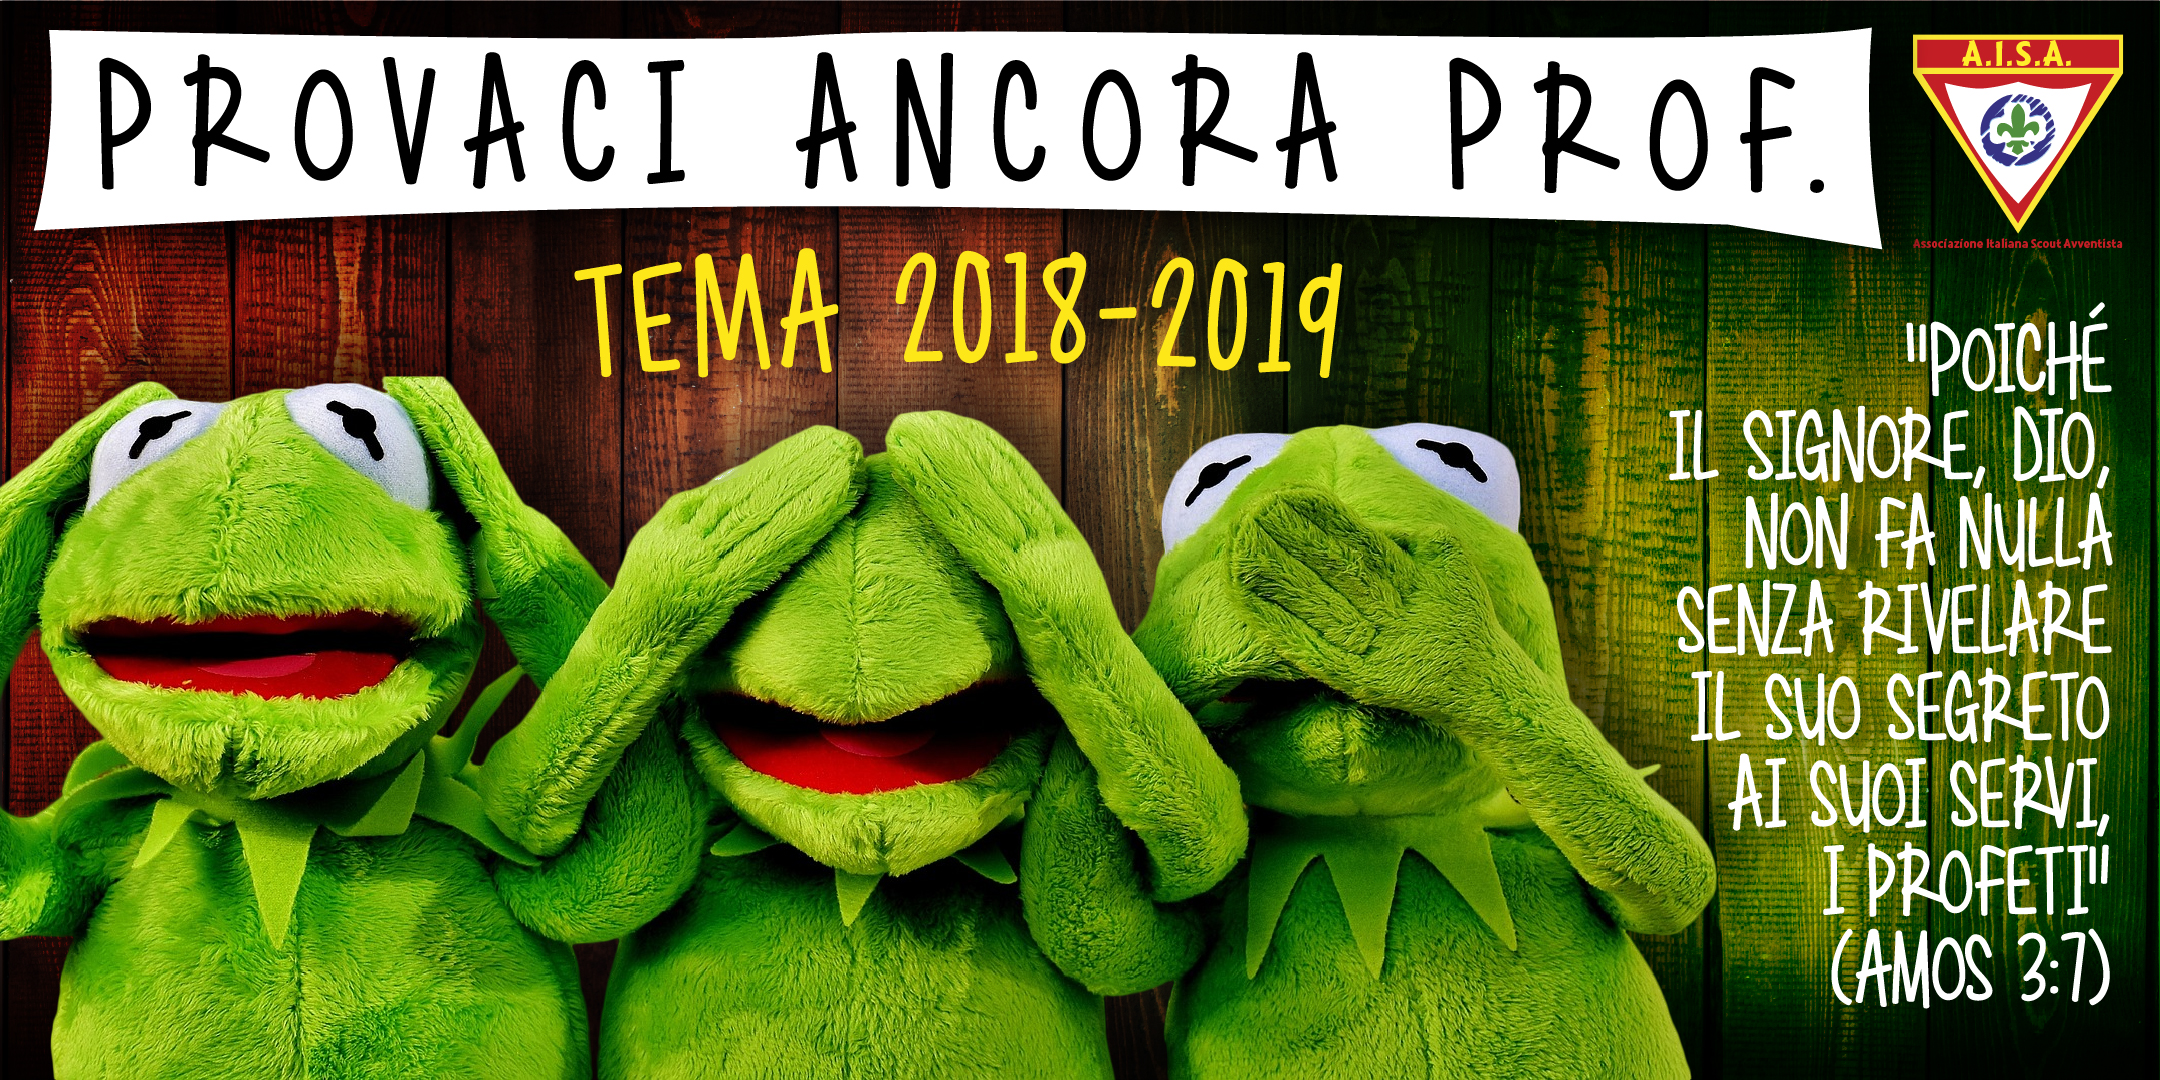 Tema AISA 2018-2019